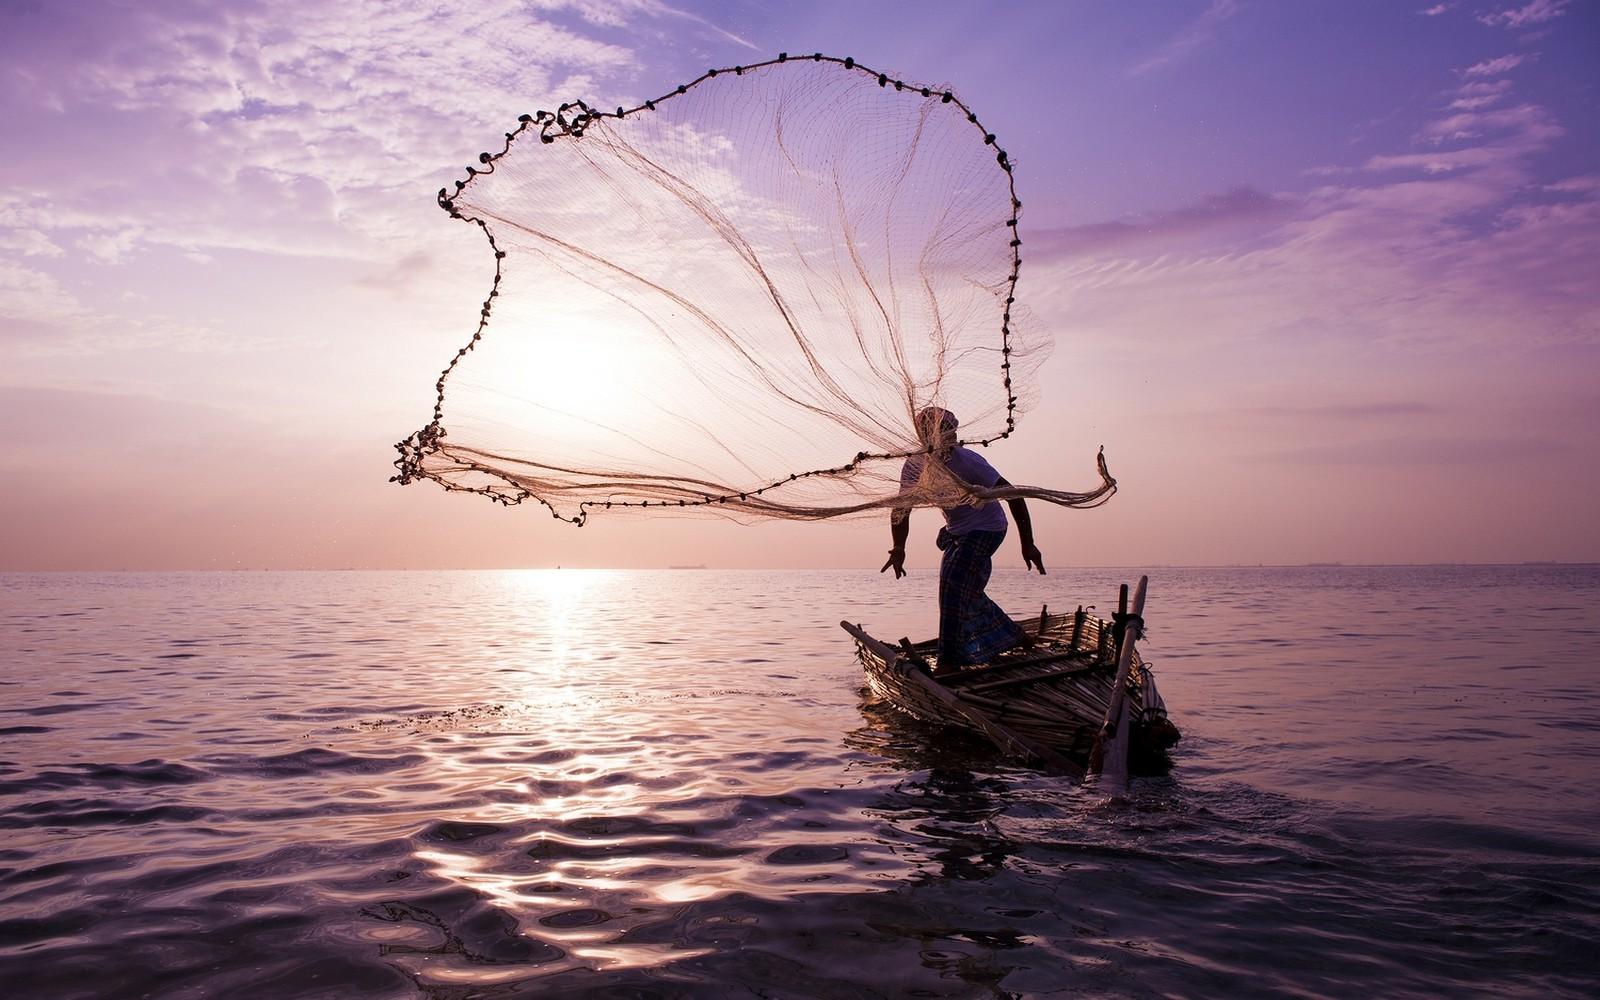 Sports Landscape Boat Sunset Sea Water Nature Clouds Sunrise Evening Mist Horizon Nests Dusk Fishing Fisherman